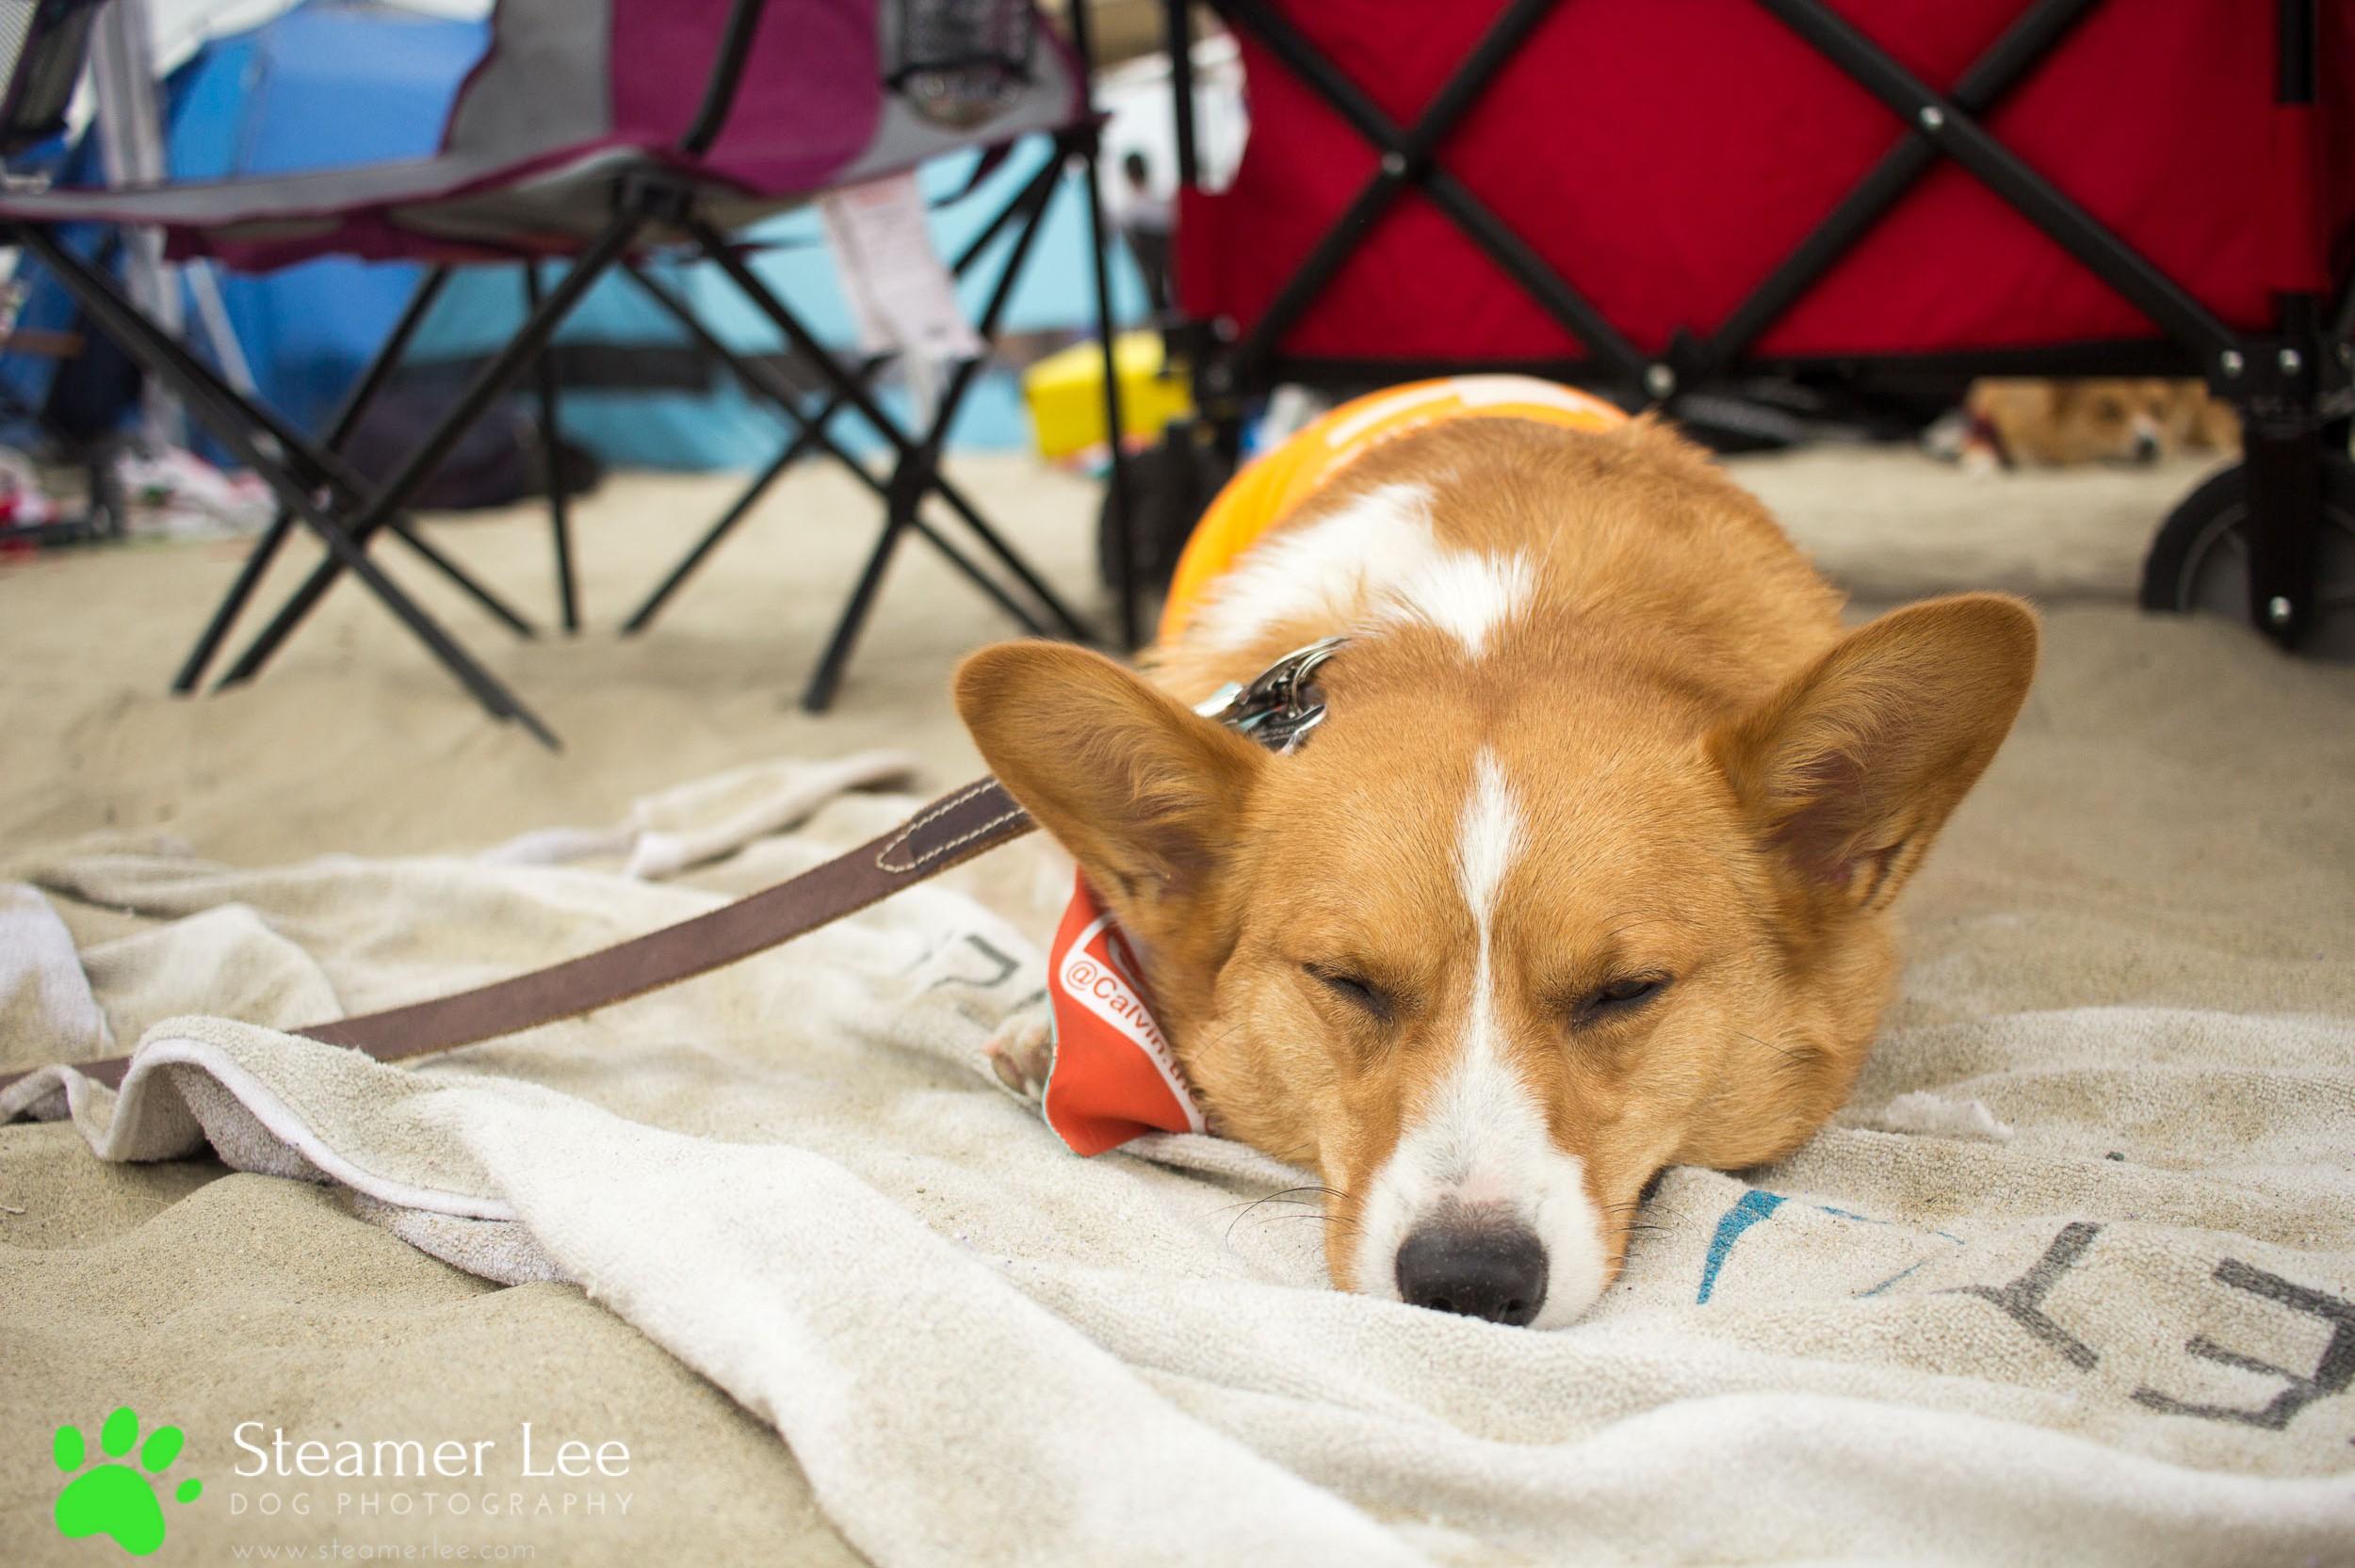 Steamer Lee Dog Photography - July 2017 So Cal Corgi Beach Day - Vol. 3 - 42.jpg